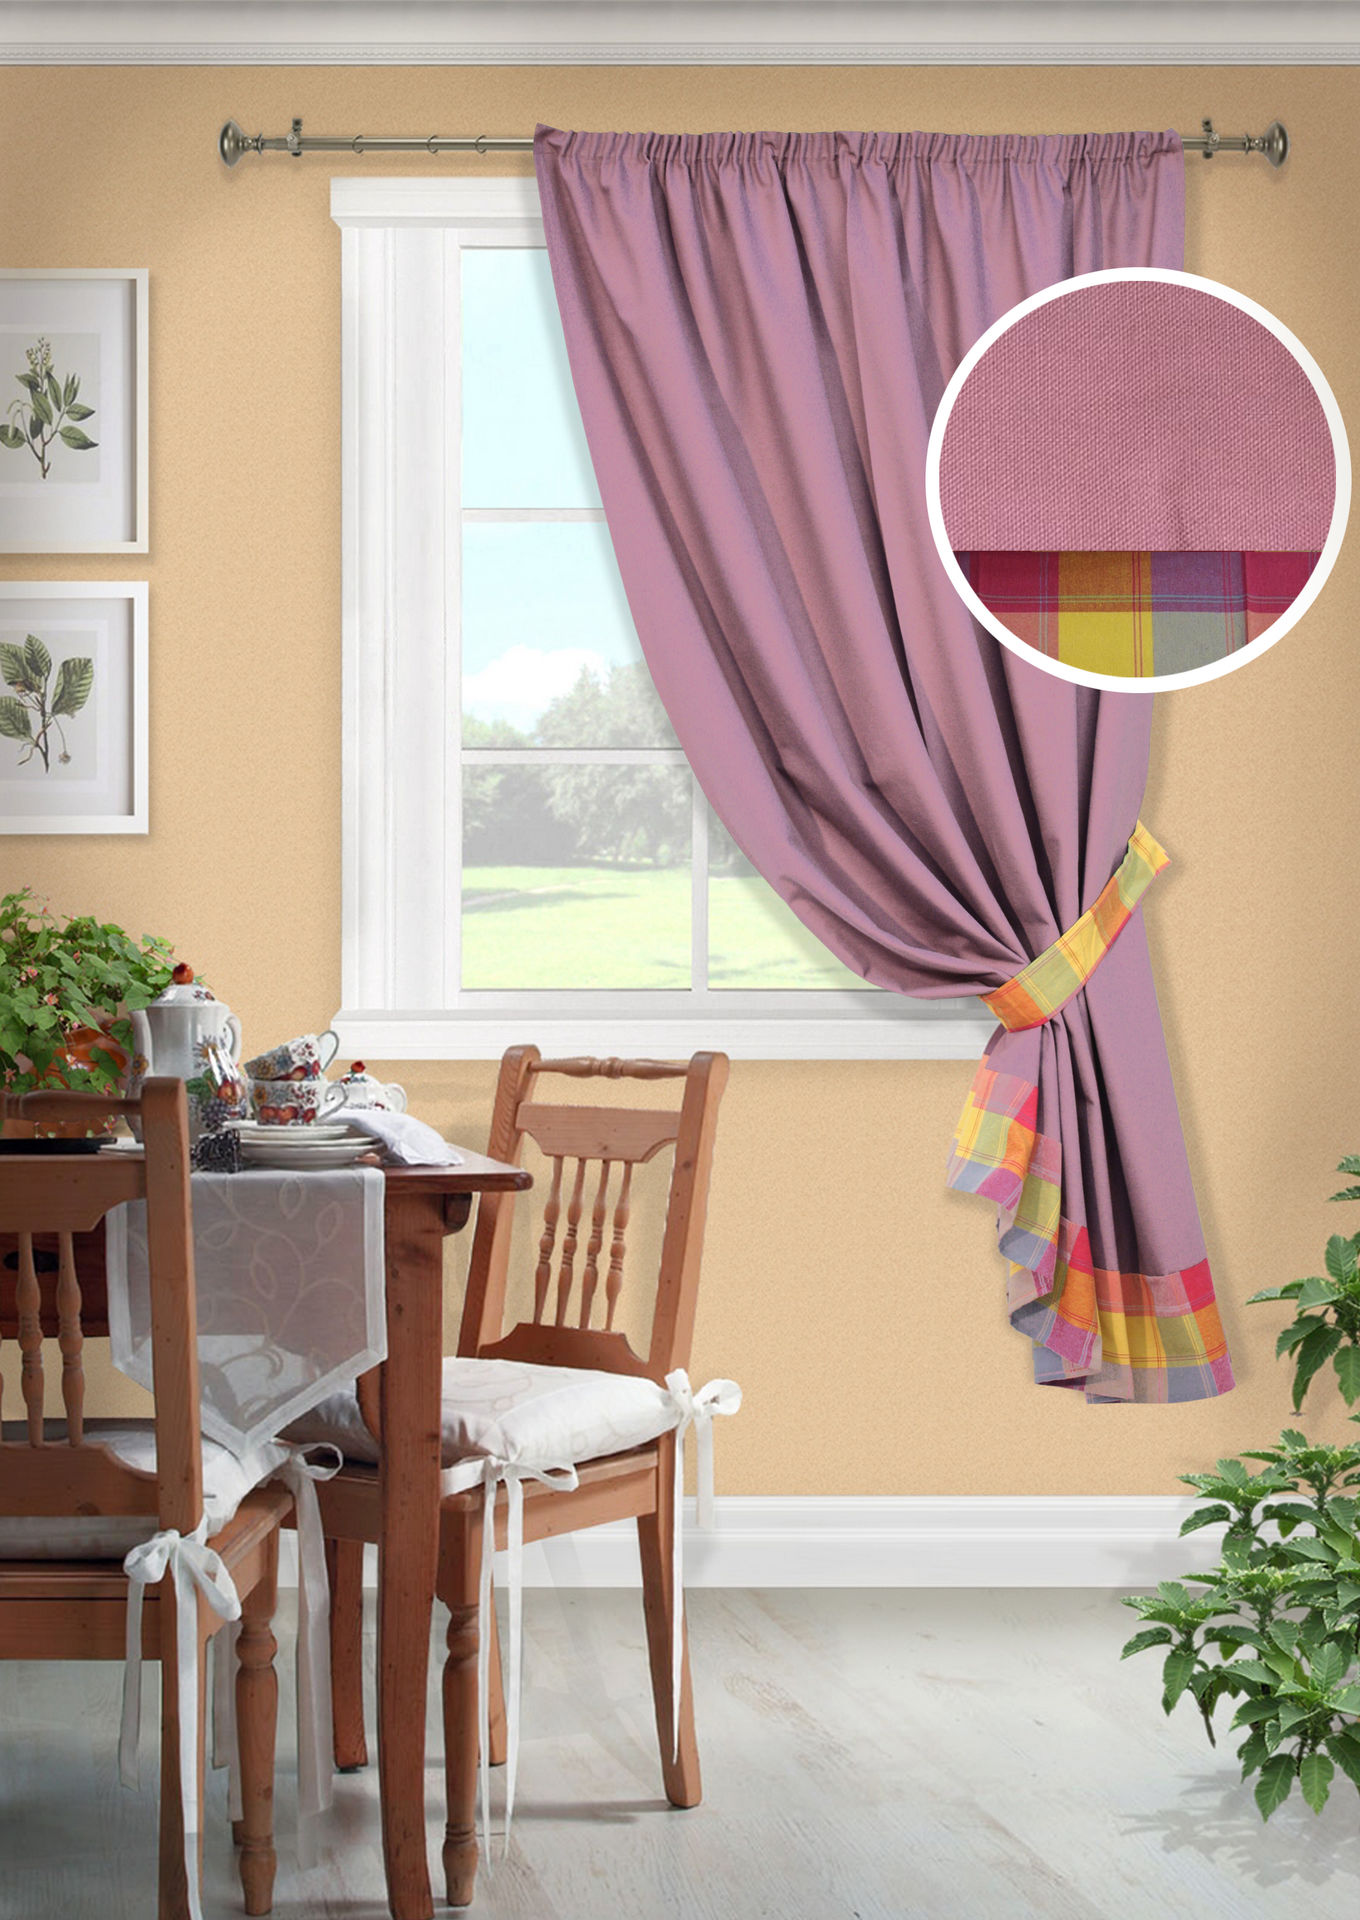 Шторы Kauffort Классические шторы Monpasie Цвет: Фиолетовый шторы kauffort классические шторы barolo